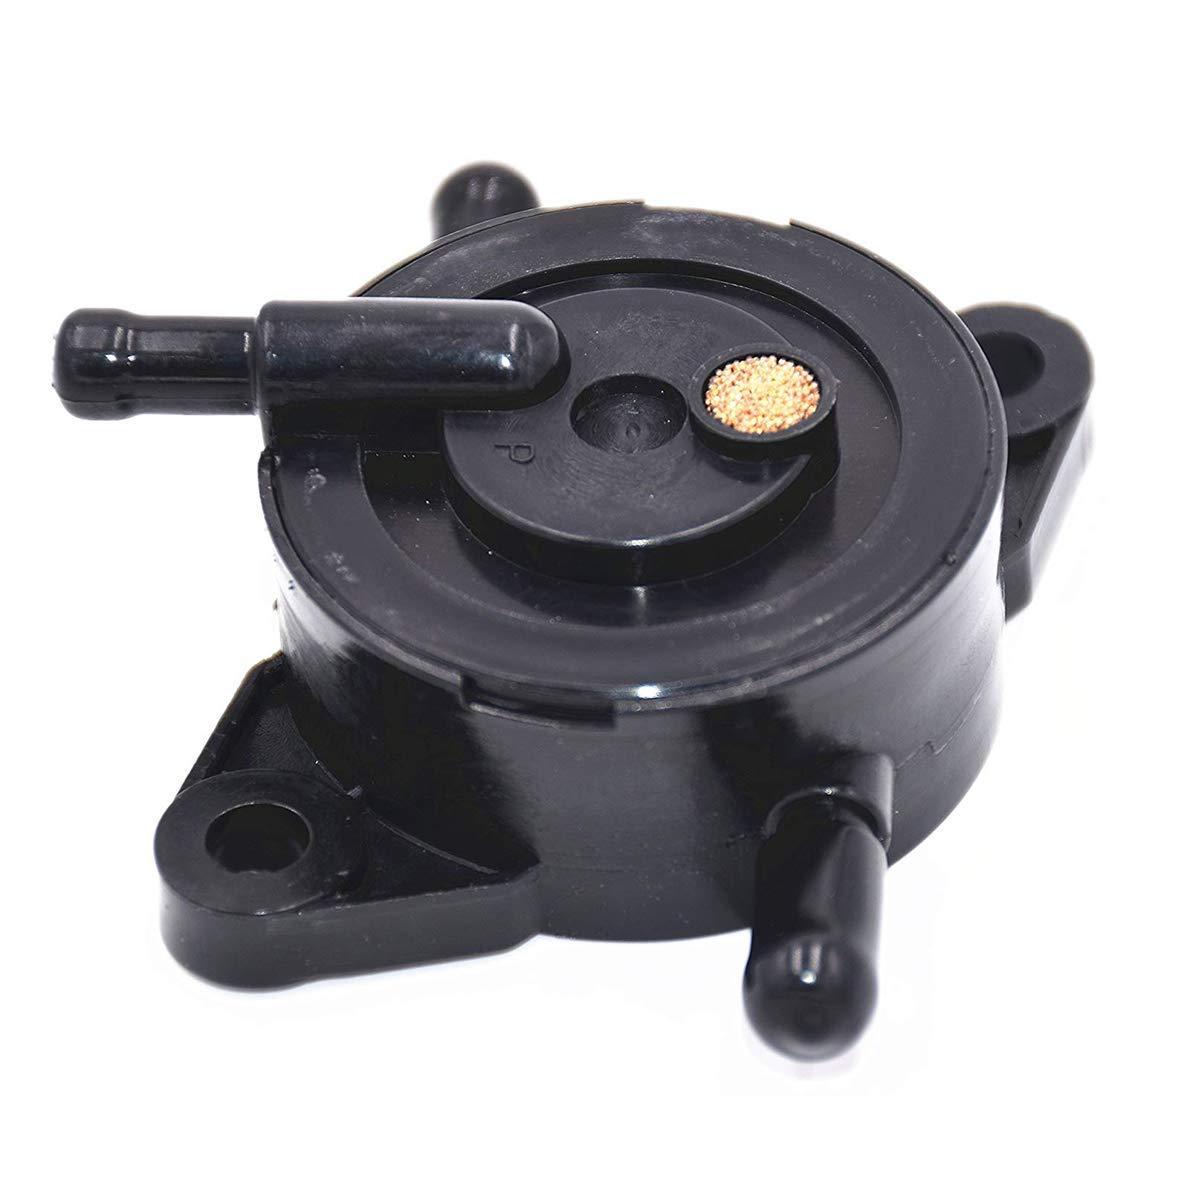 AUTVAN Fuel Pump For Kawasaki 49040-0770 49040-7008 FR/FX/ FS 481V, 541V, 600V, 651V, 691V and 730V Engines New HAOHAO